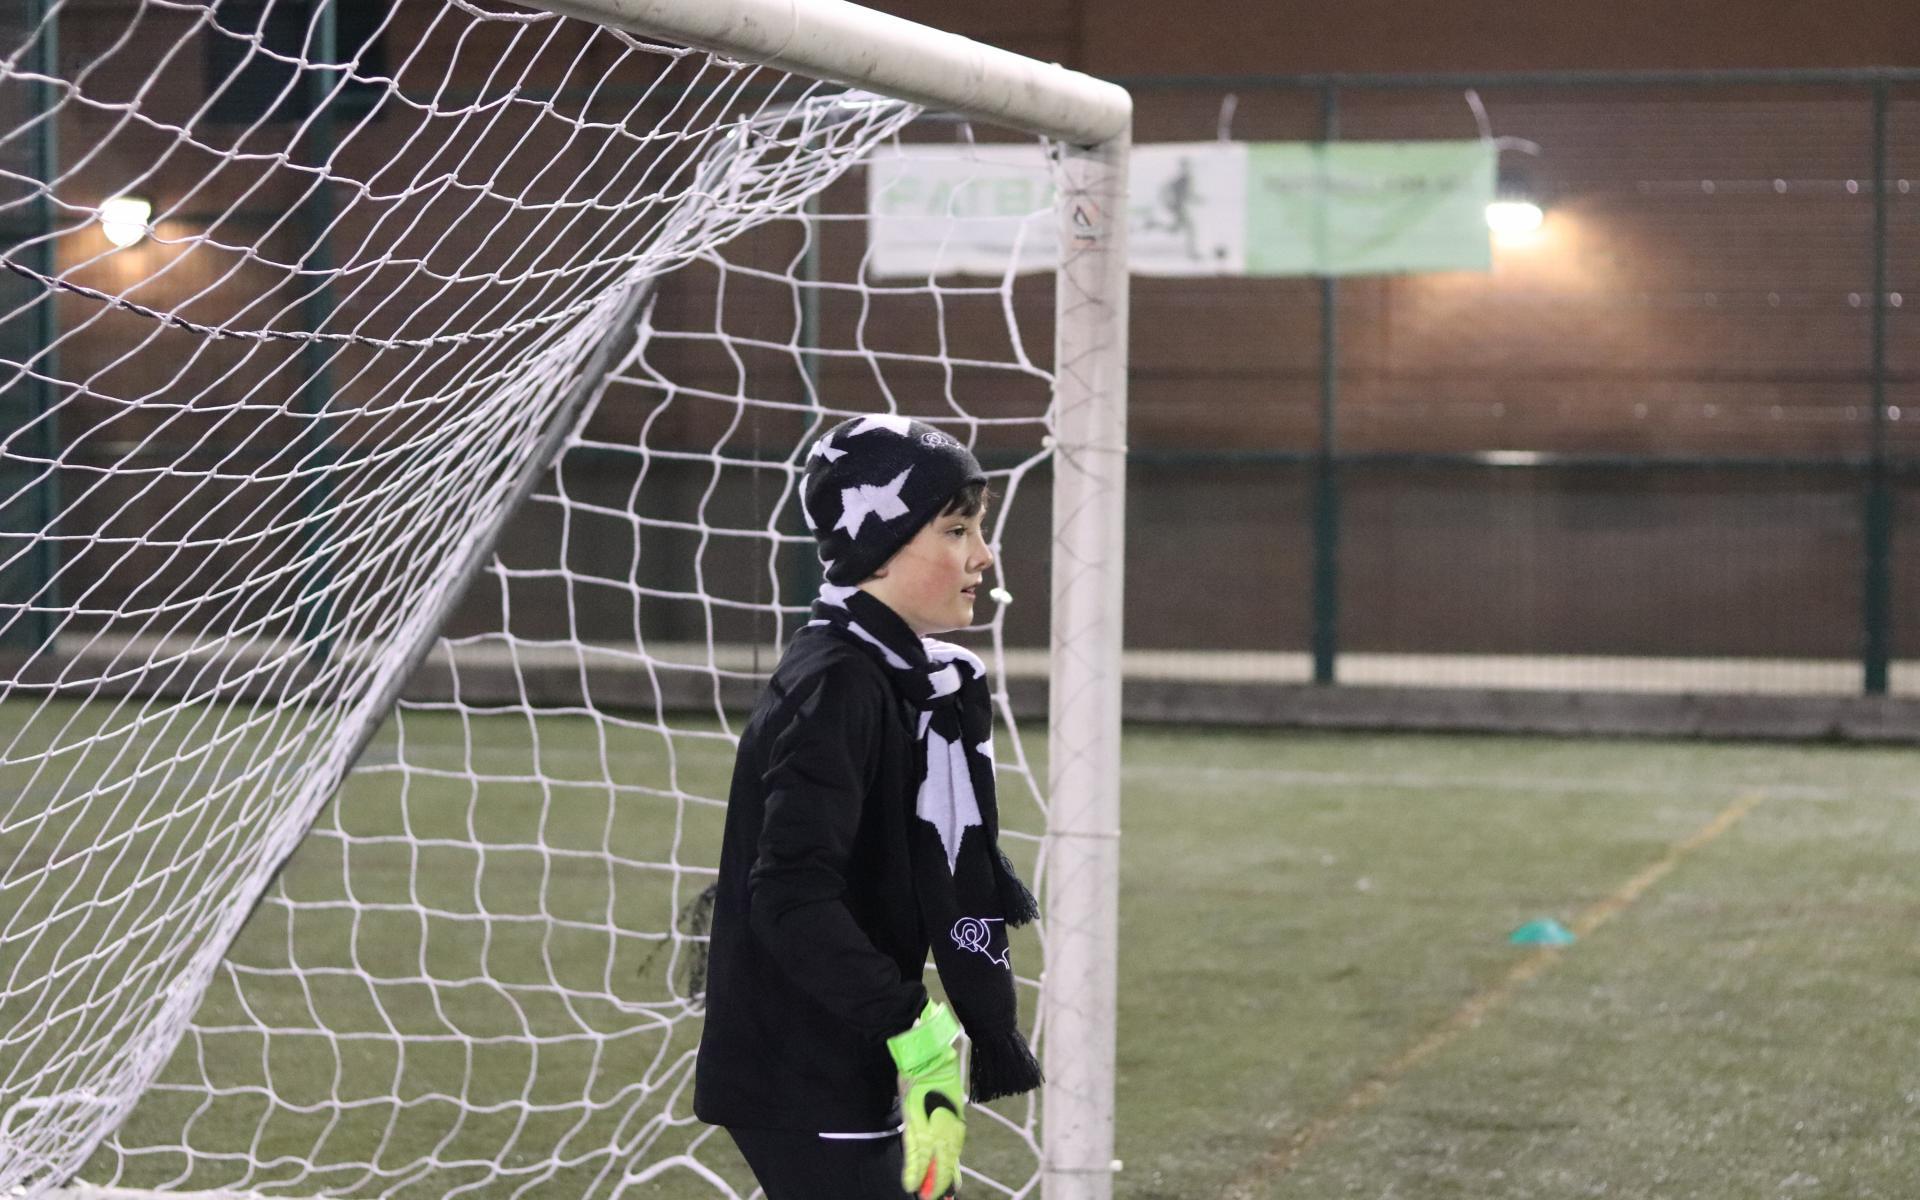 Child in goal